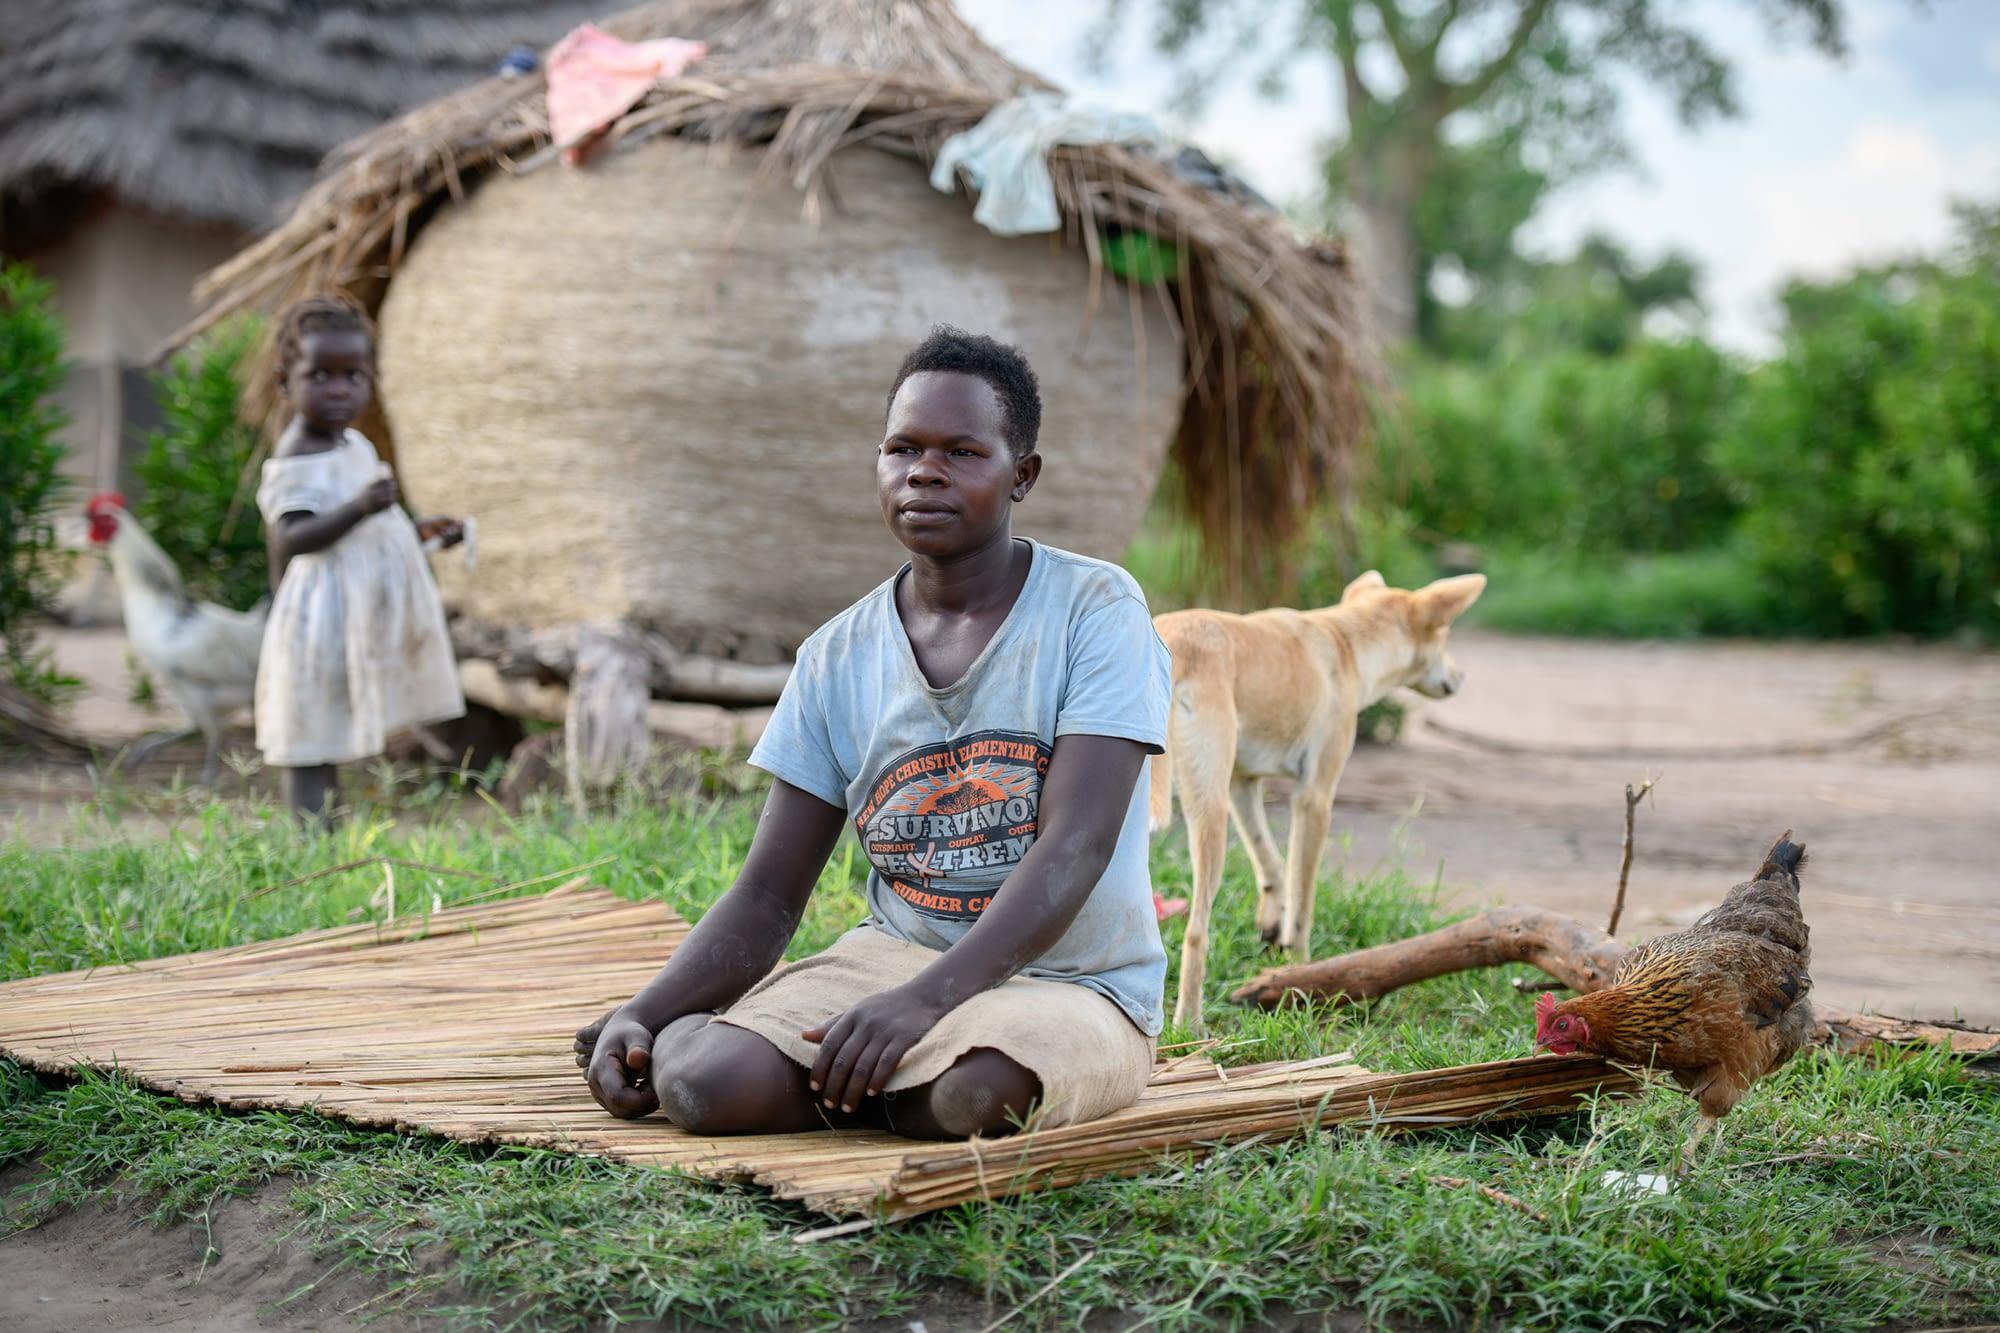 Woman sitting in rural village